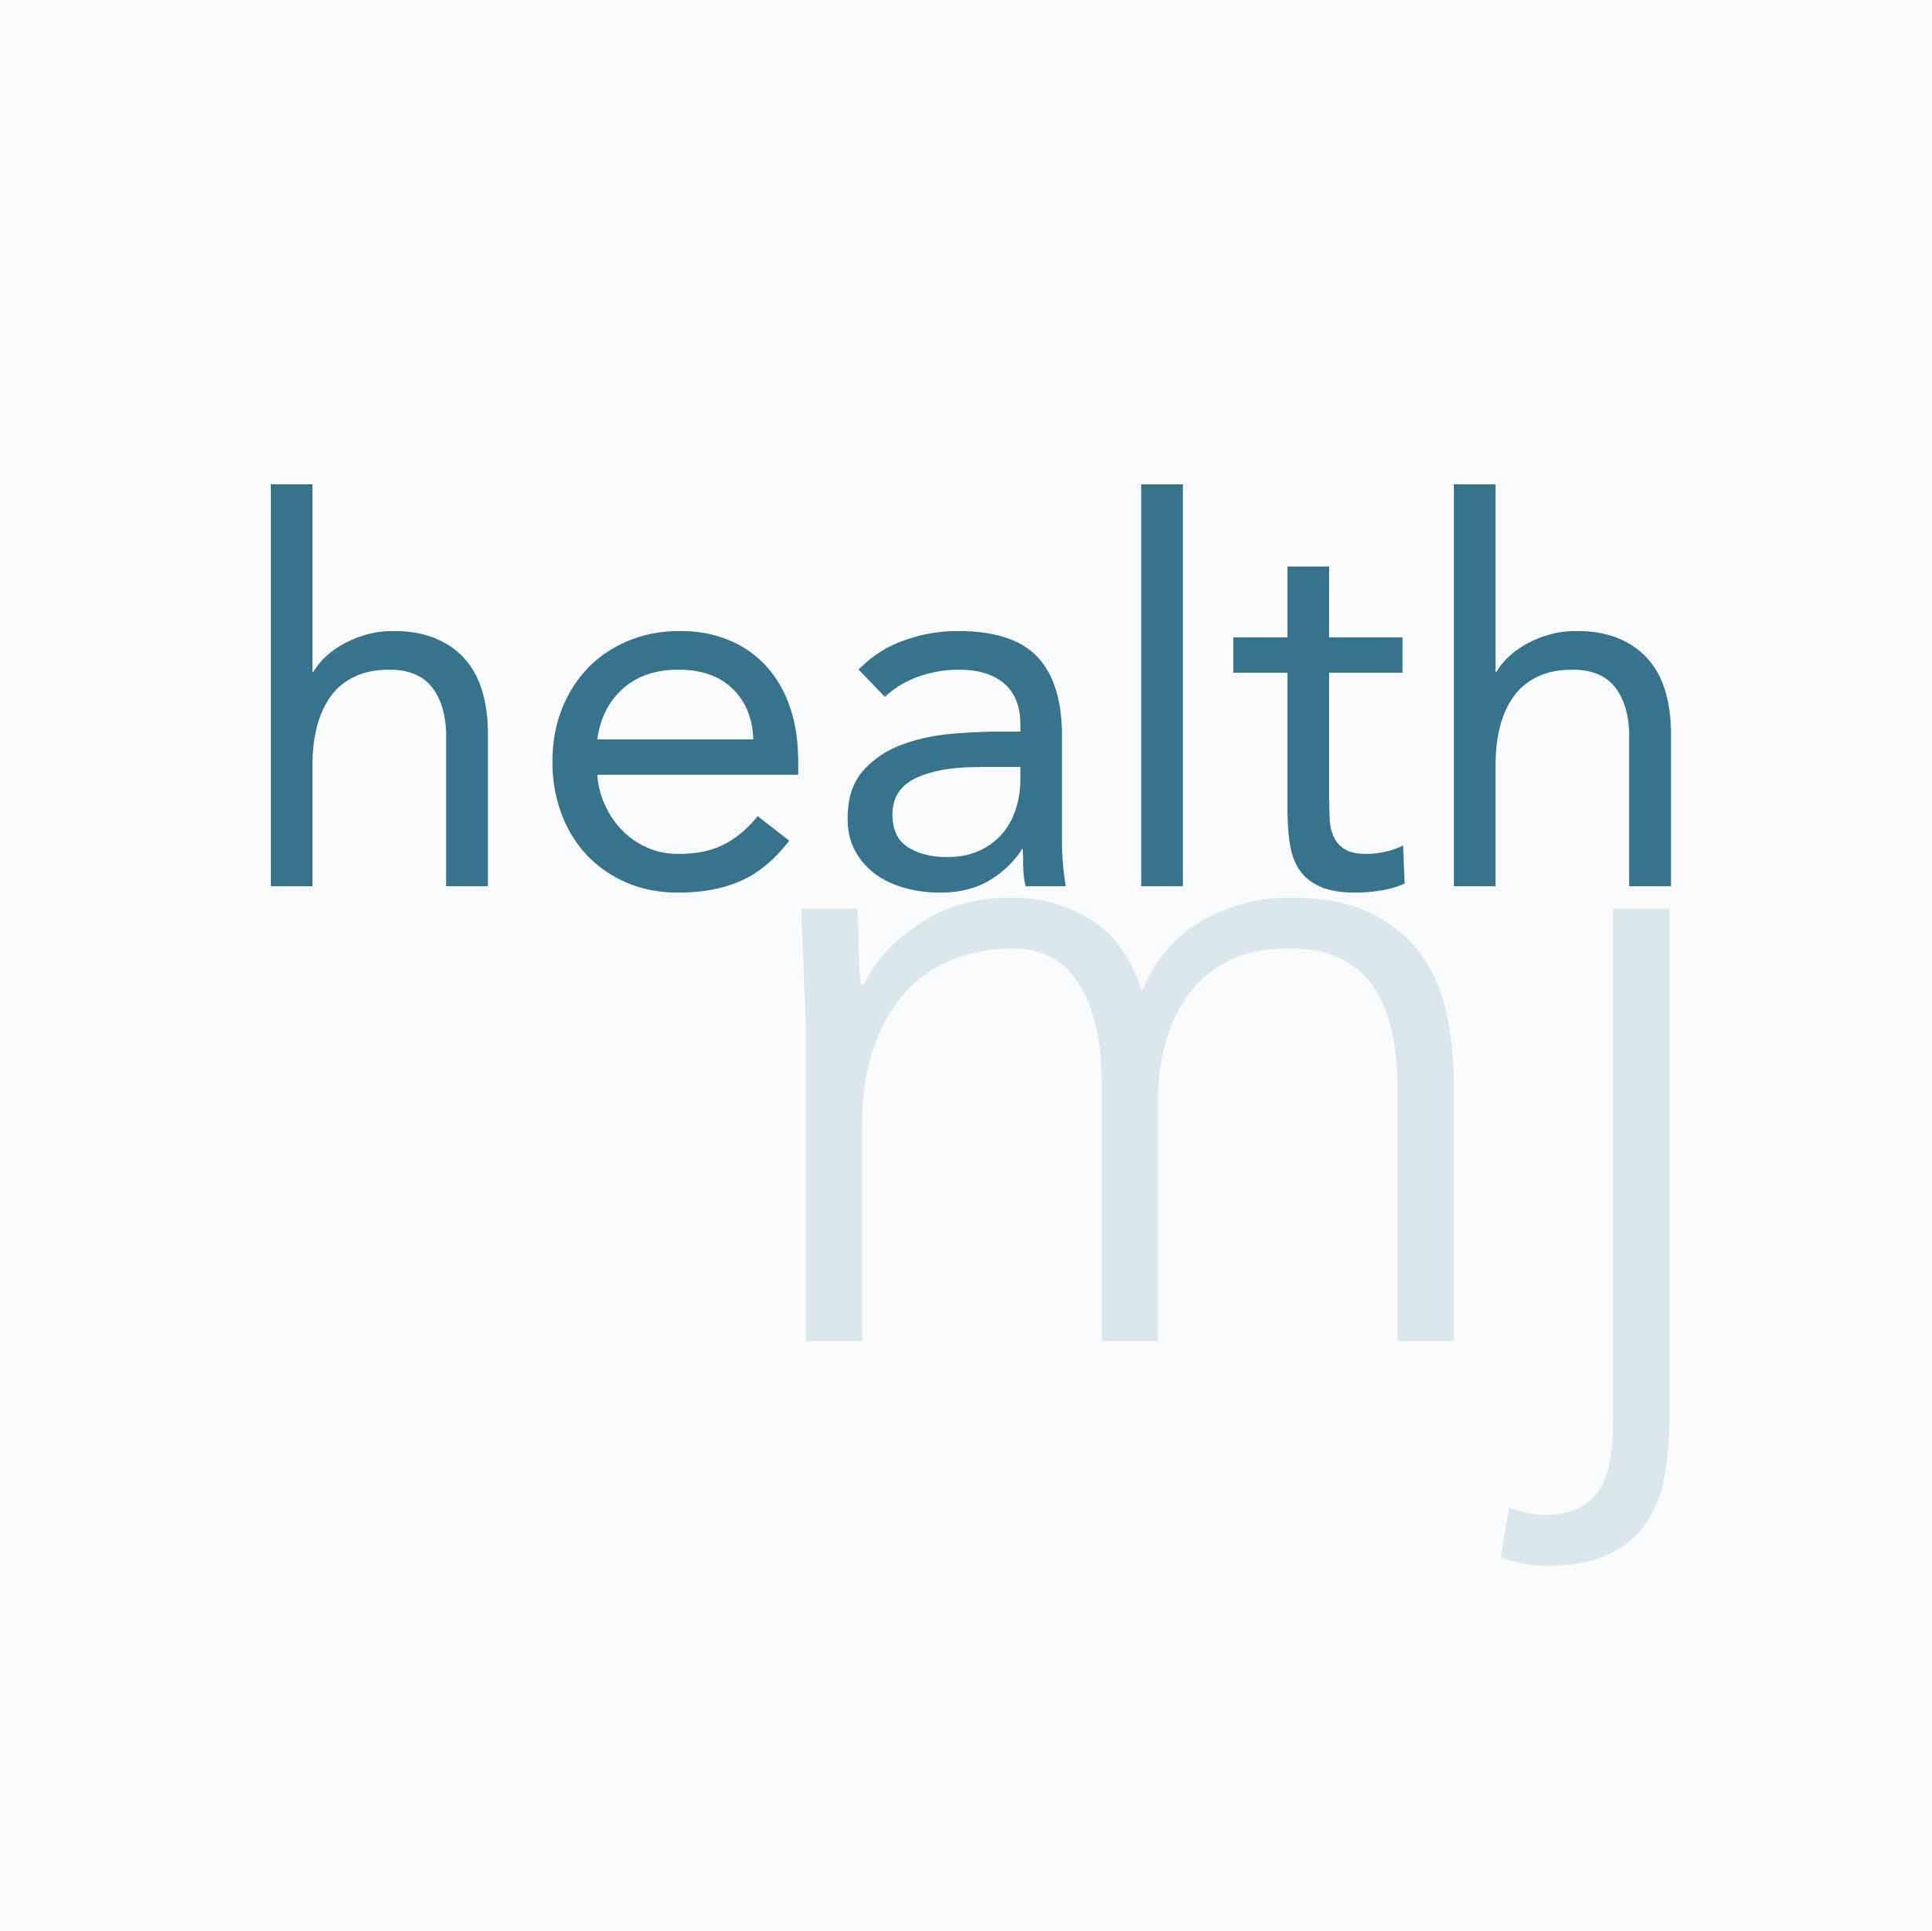 HealthMJ.com Helps Put Focus On Marijuana Cancer Patients